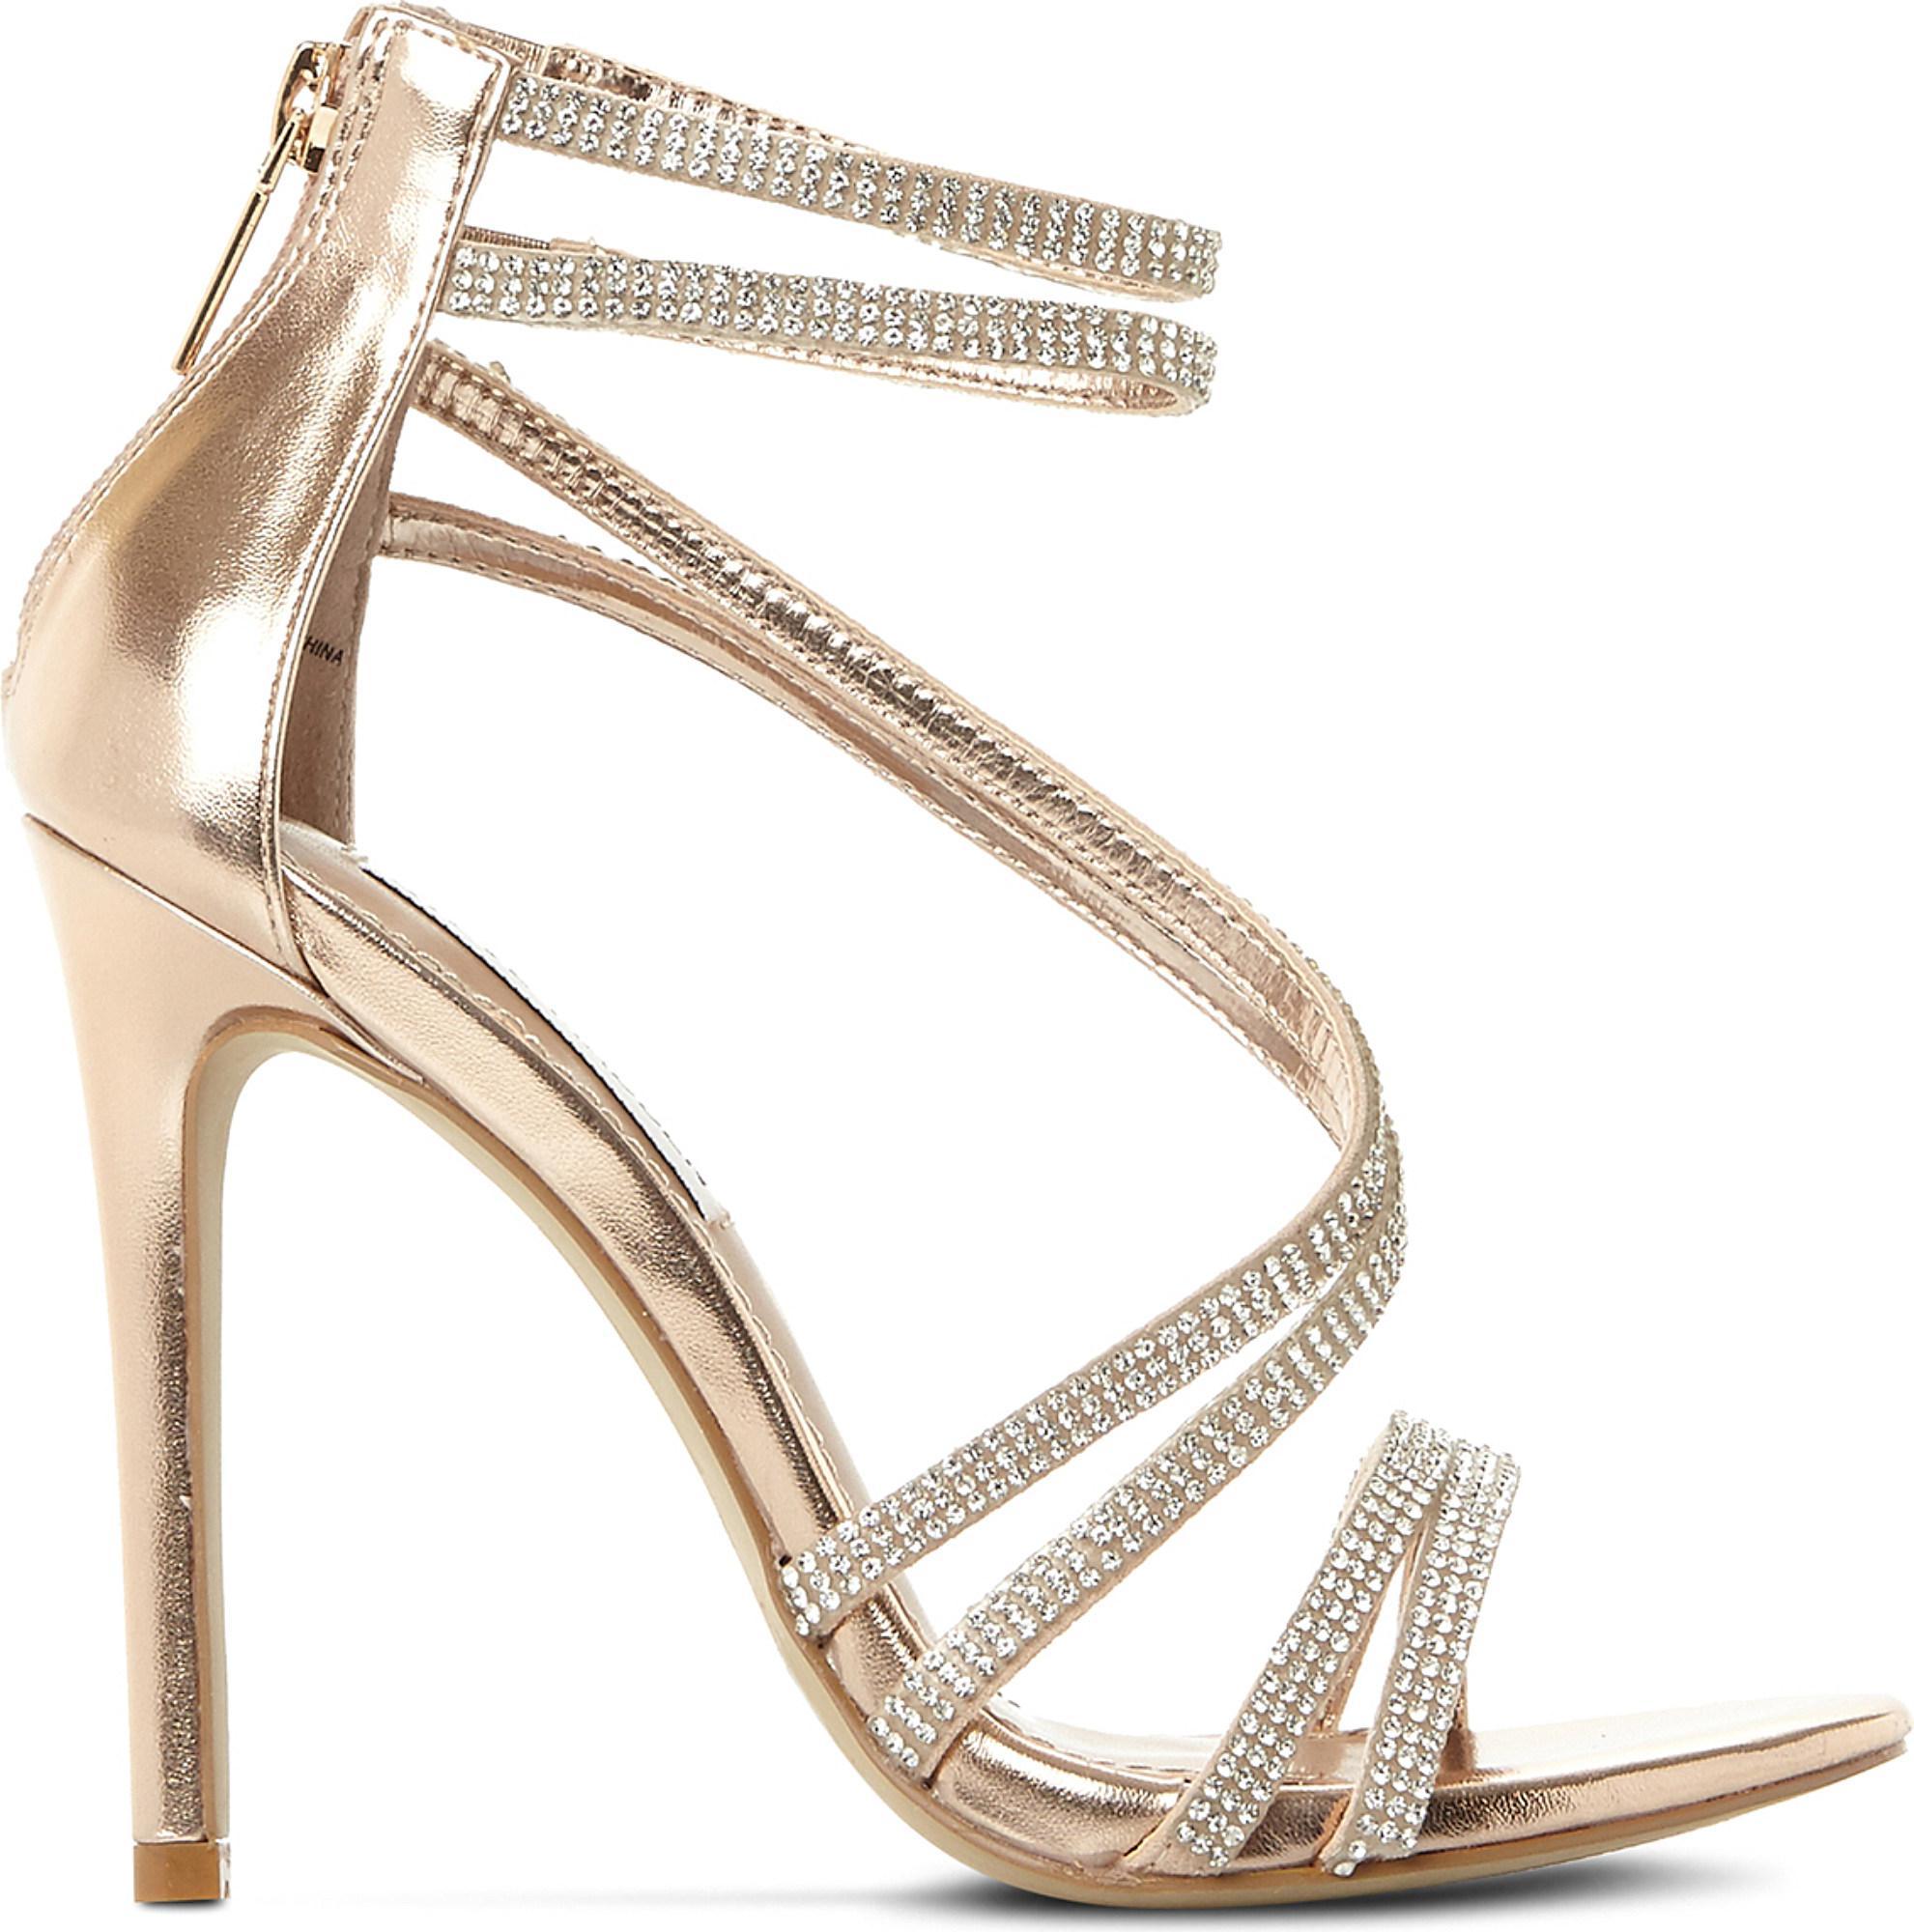 21ae5582cf06 Steve Madden Sweetest Embellished Heeled Sandals in Metallic - Lyst